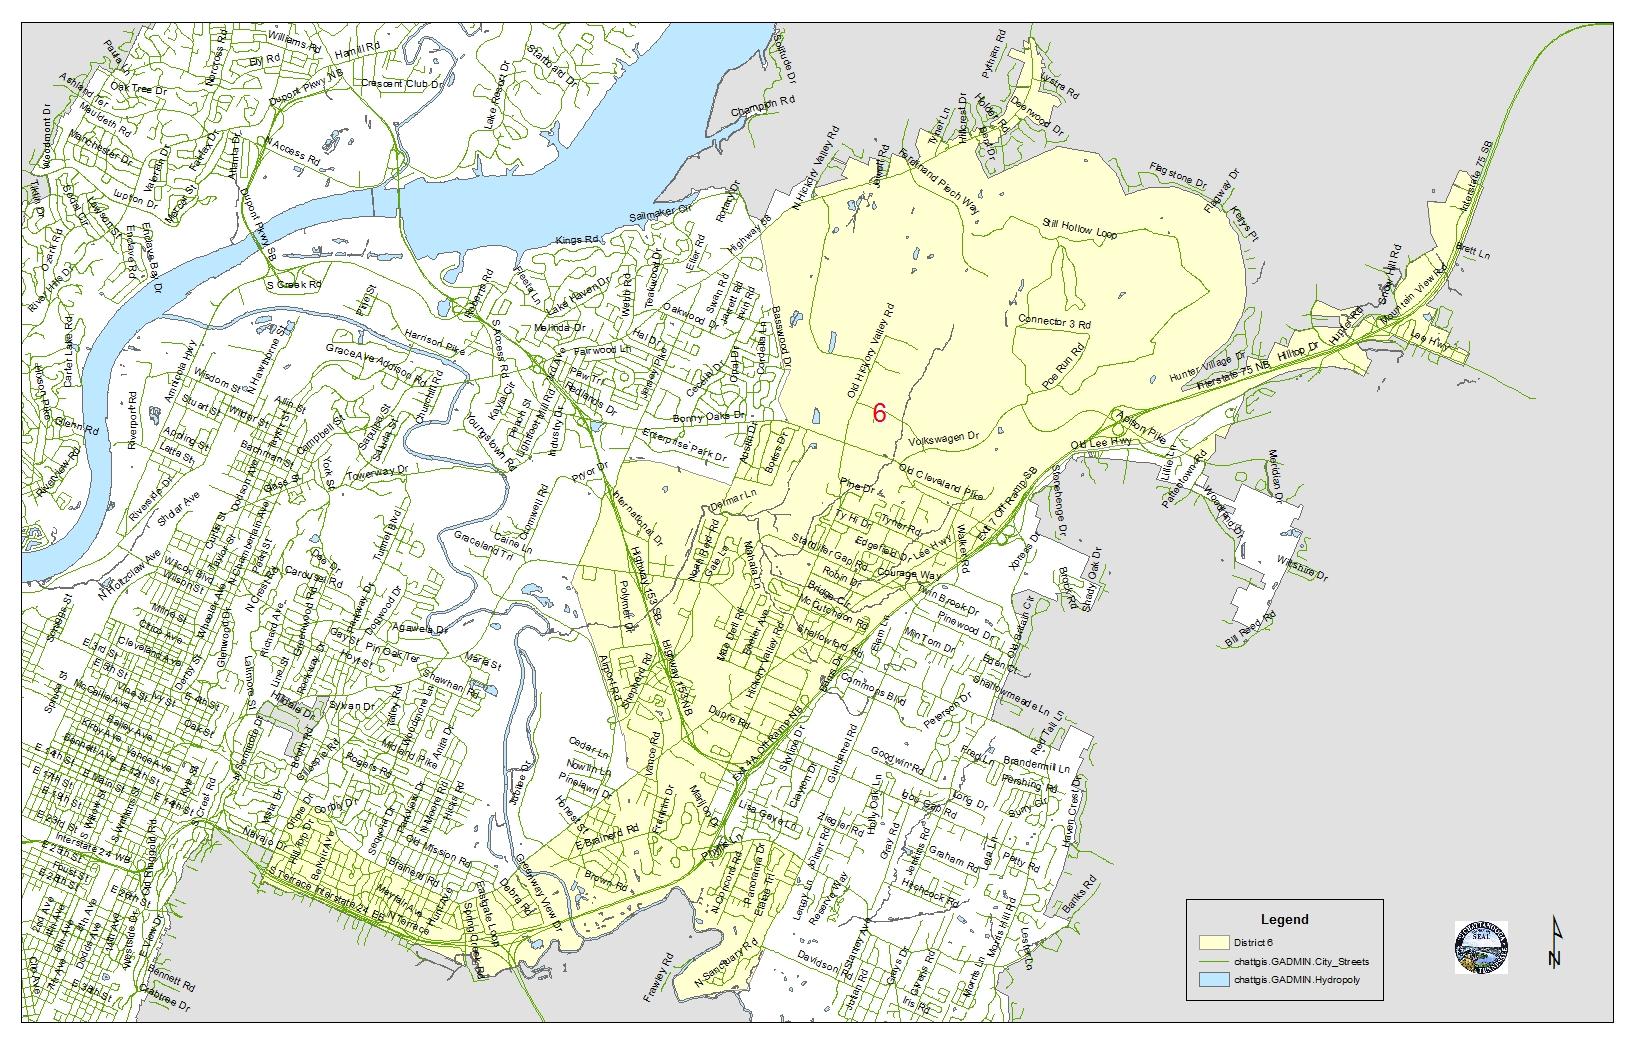 district 6 footprint